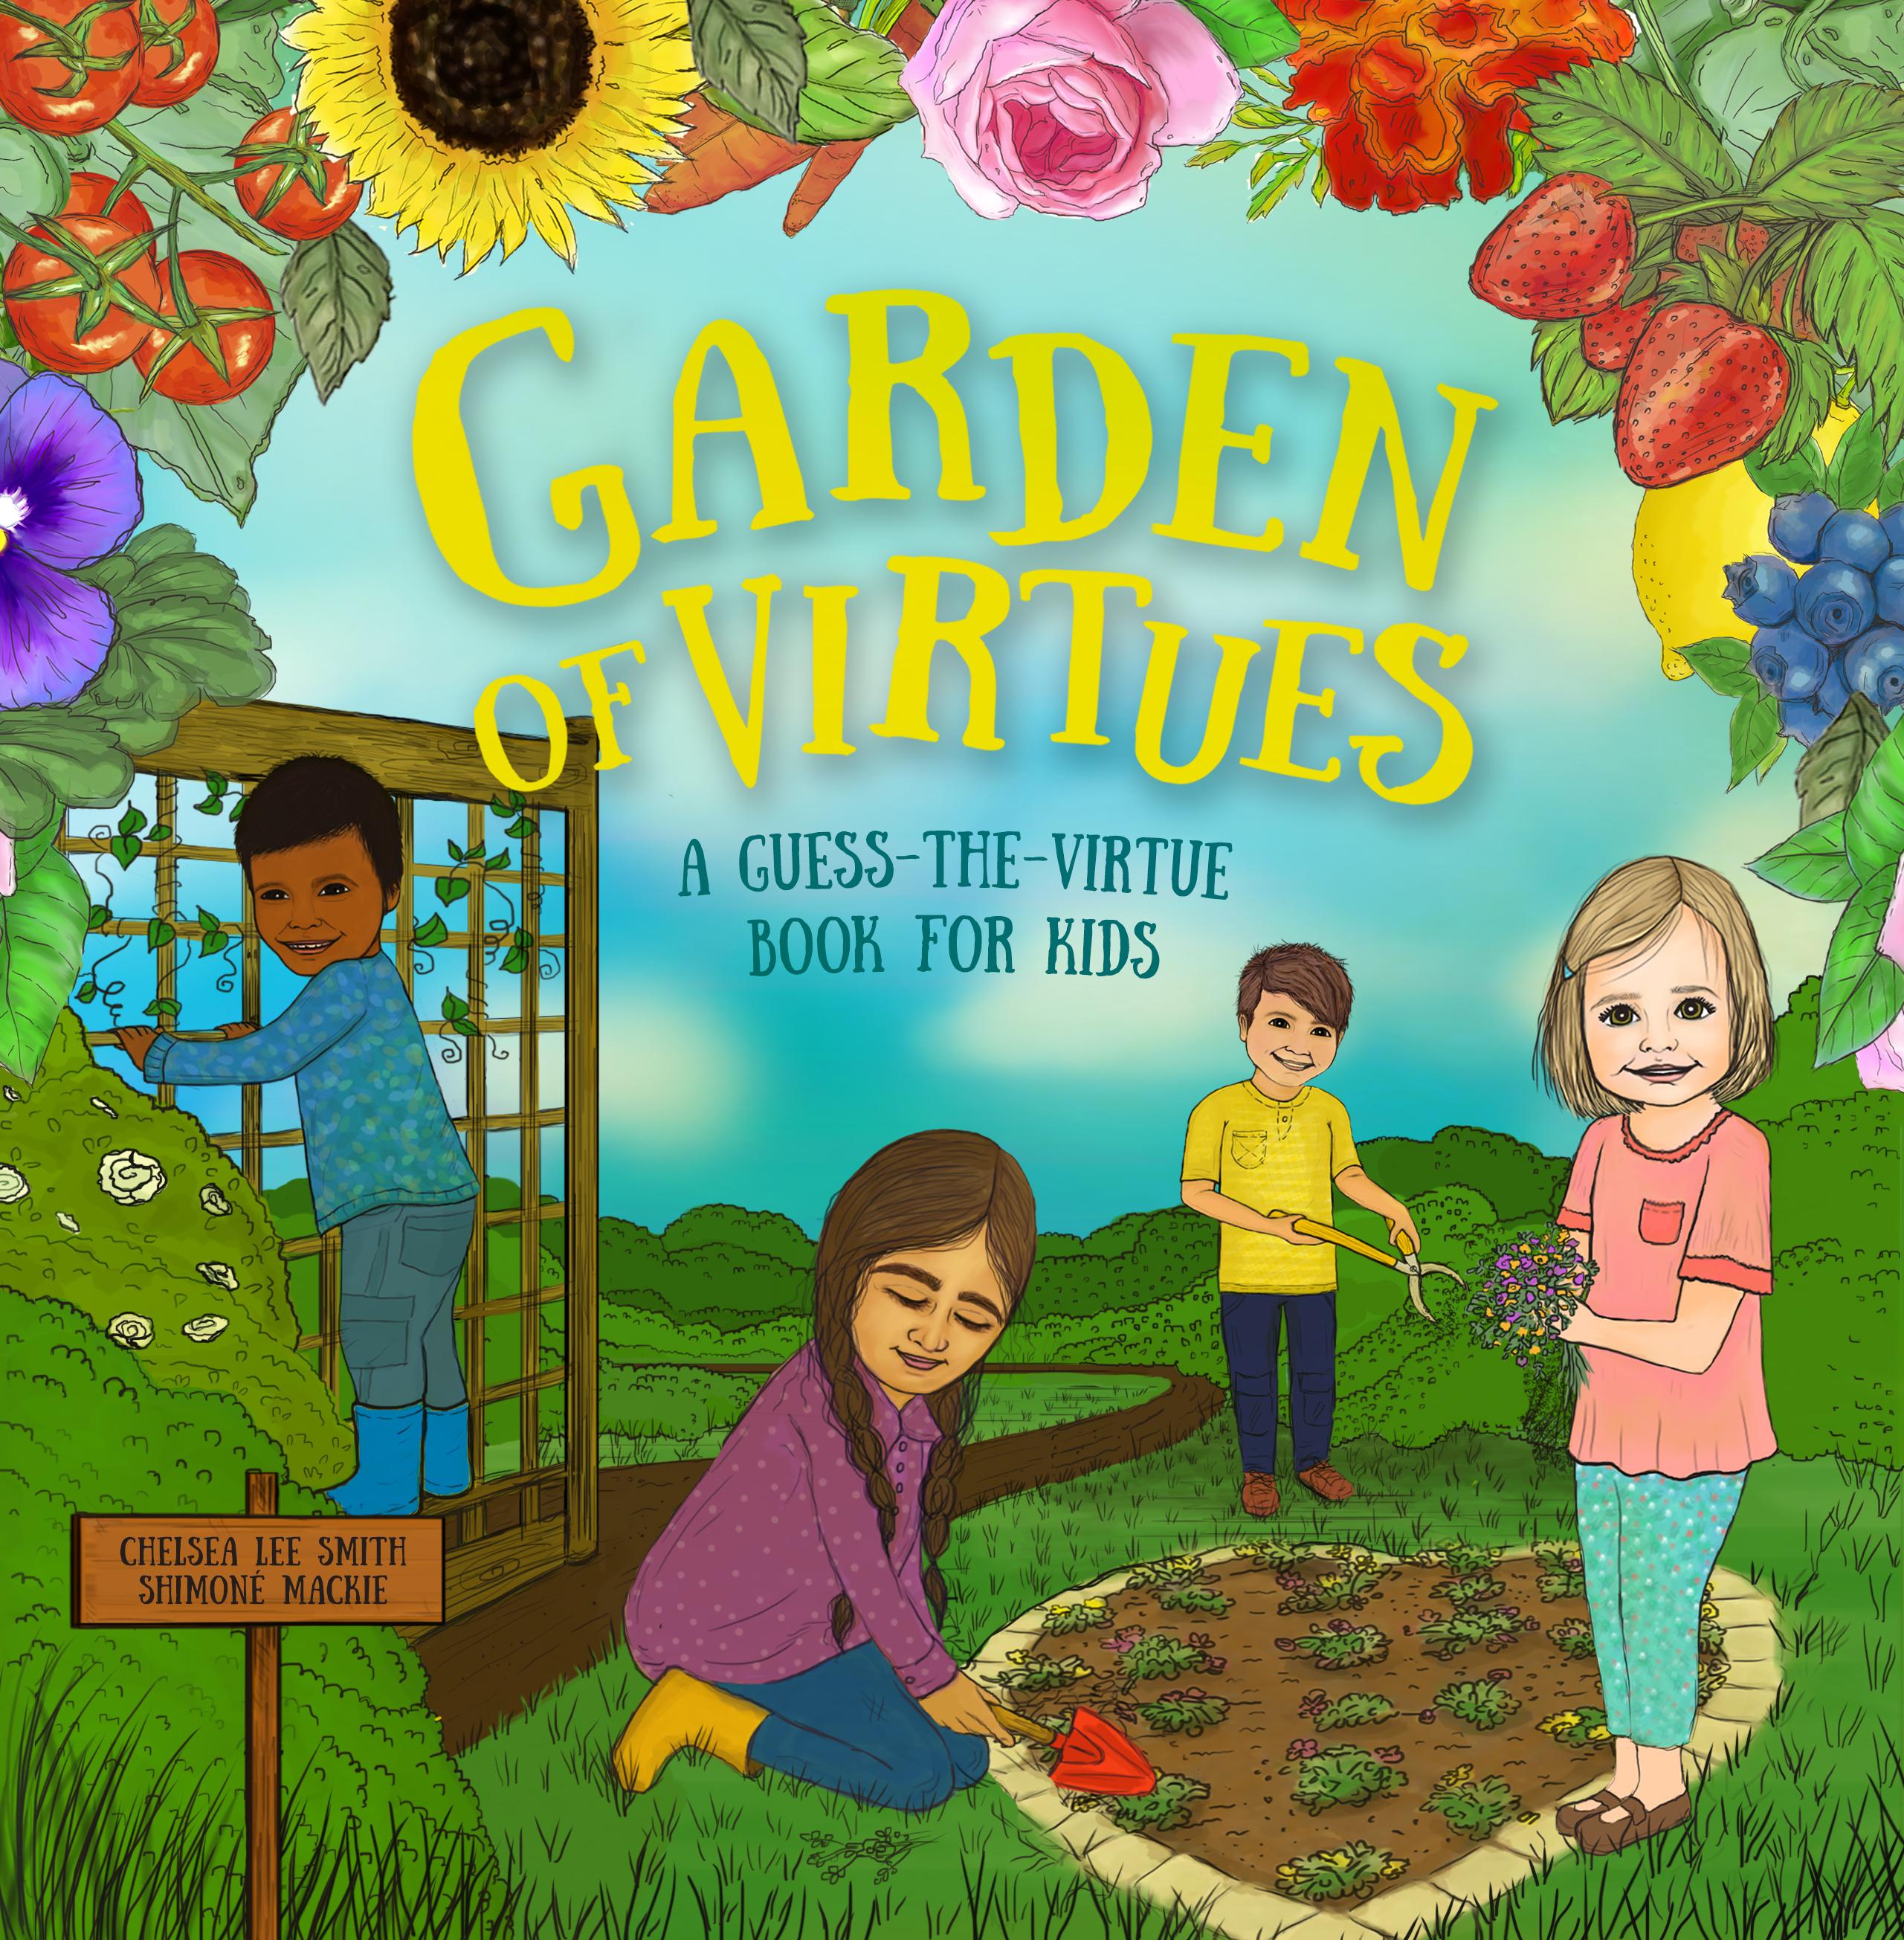 GardenofVirtues front